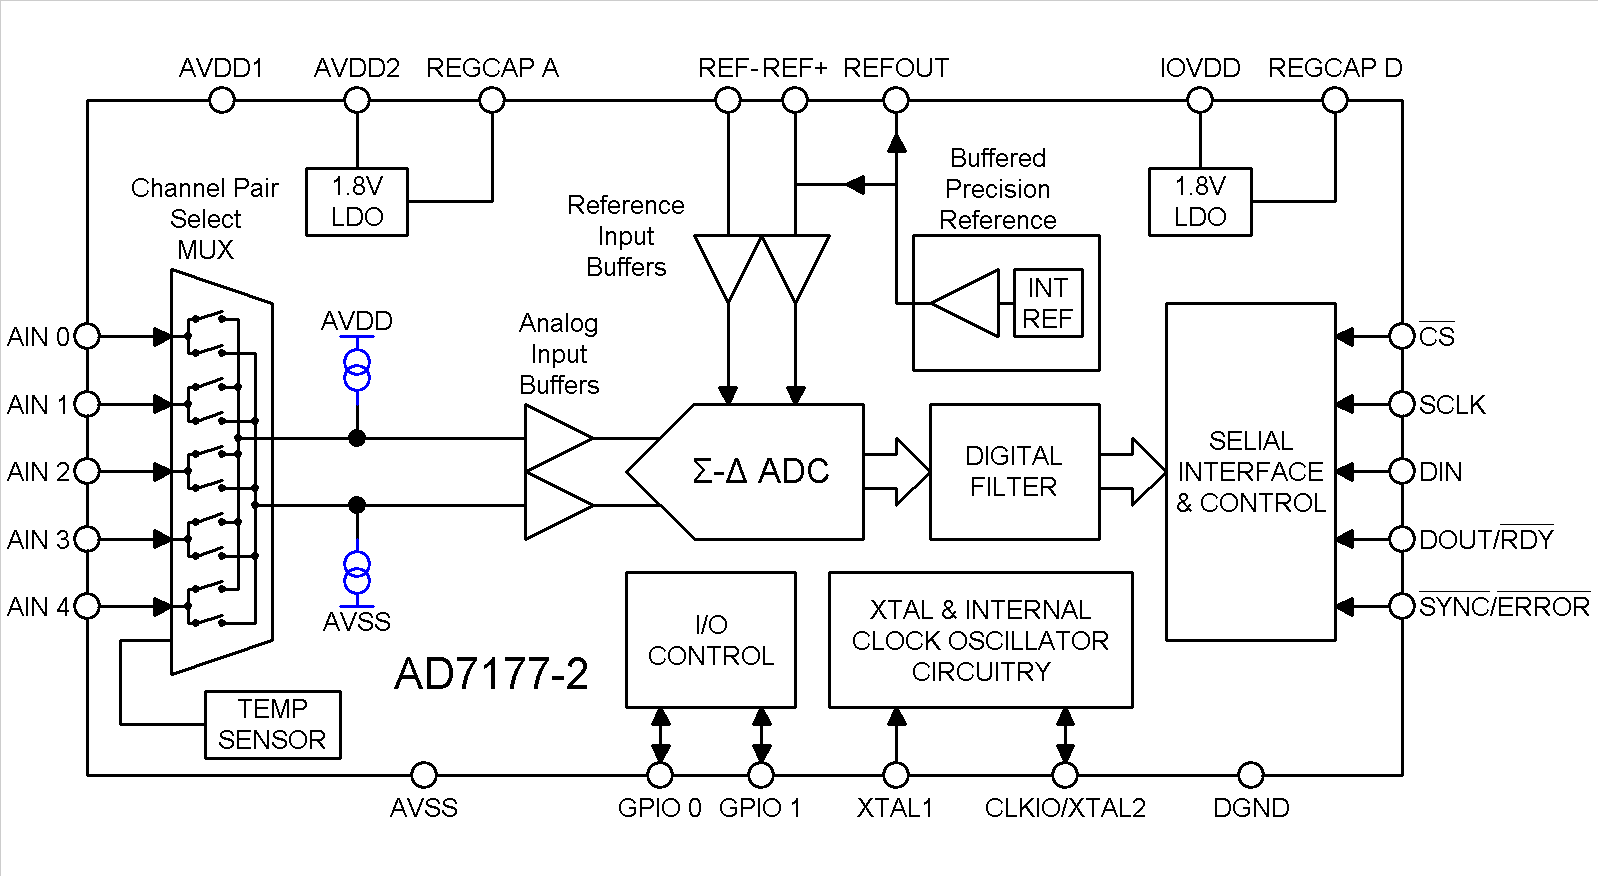 AD7177-2